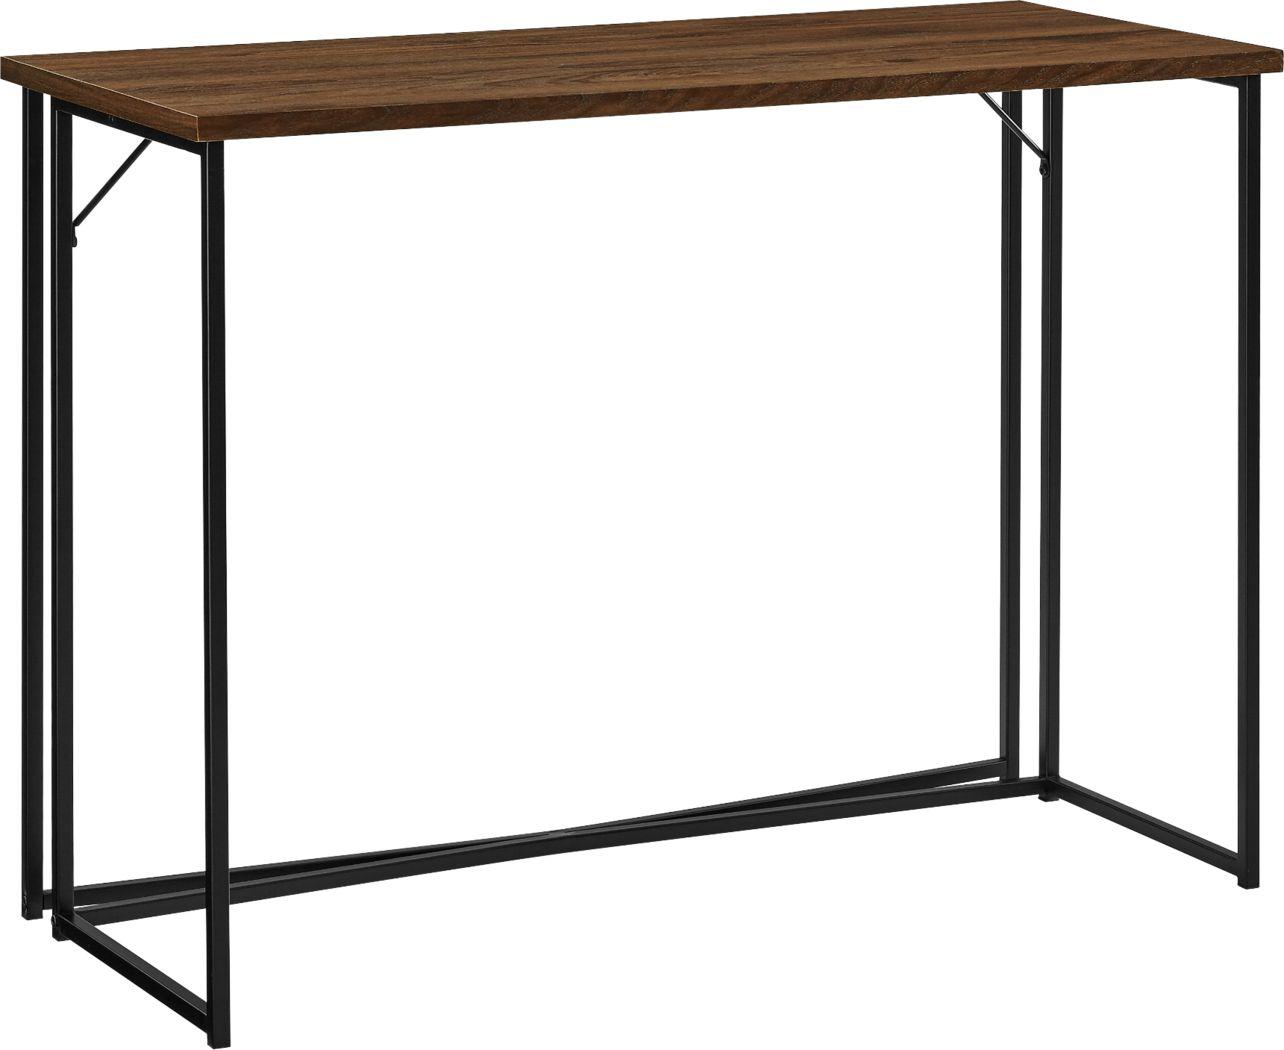 Carwill Walnut Desk